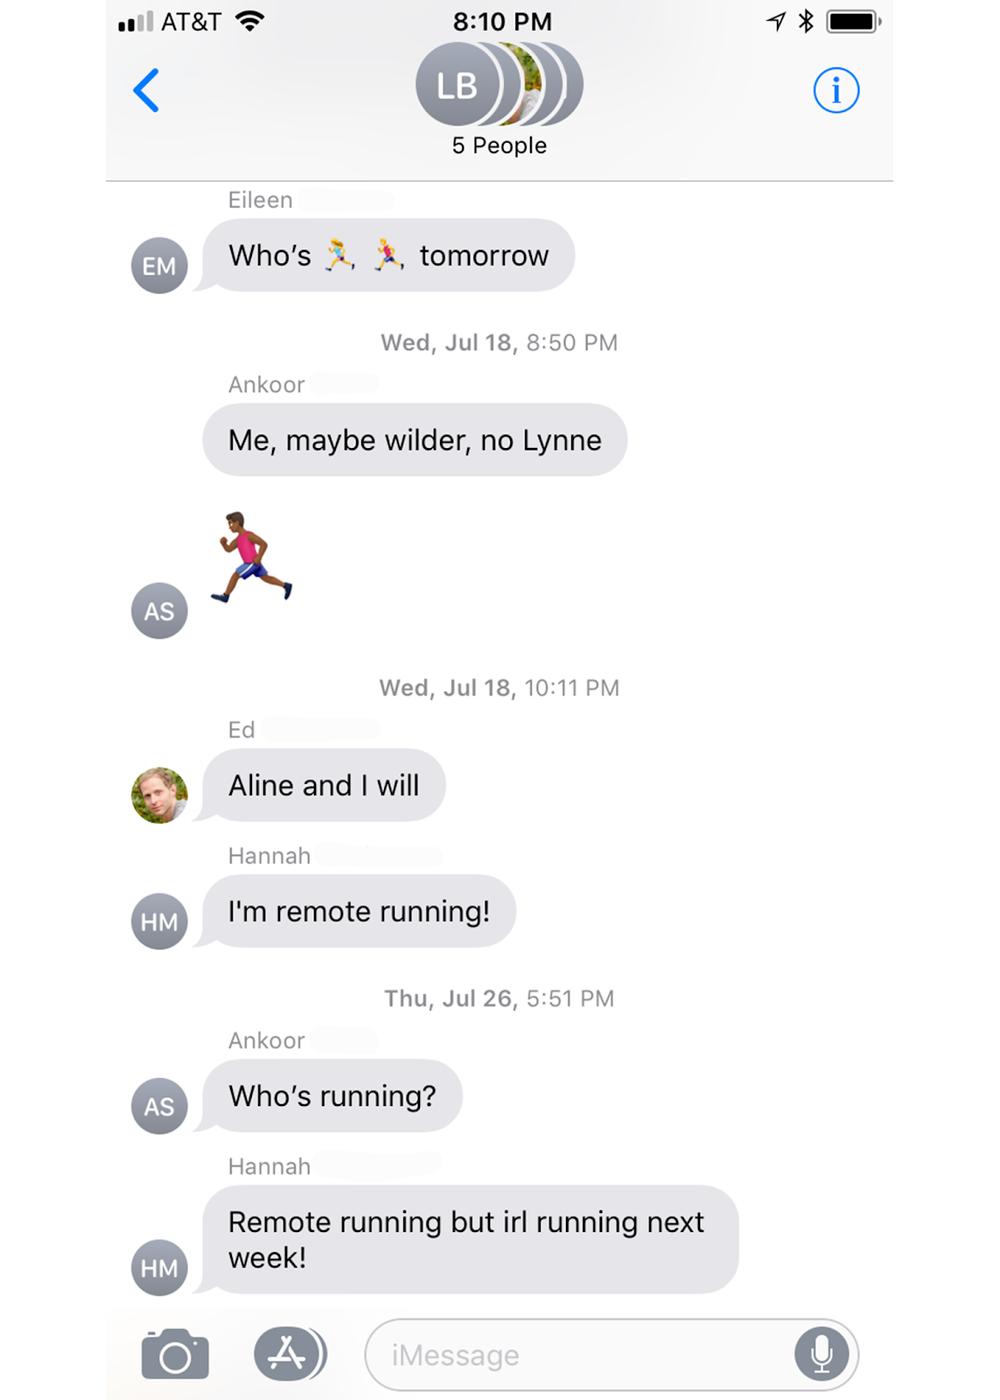 Ponysaurus-run-chat-screenshot.png